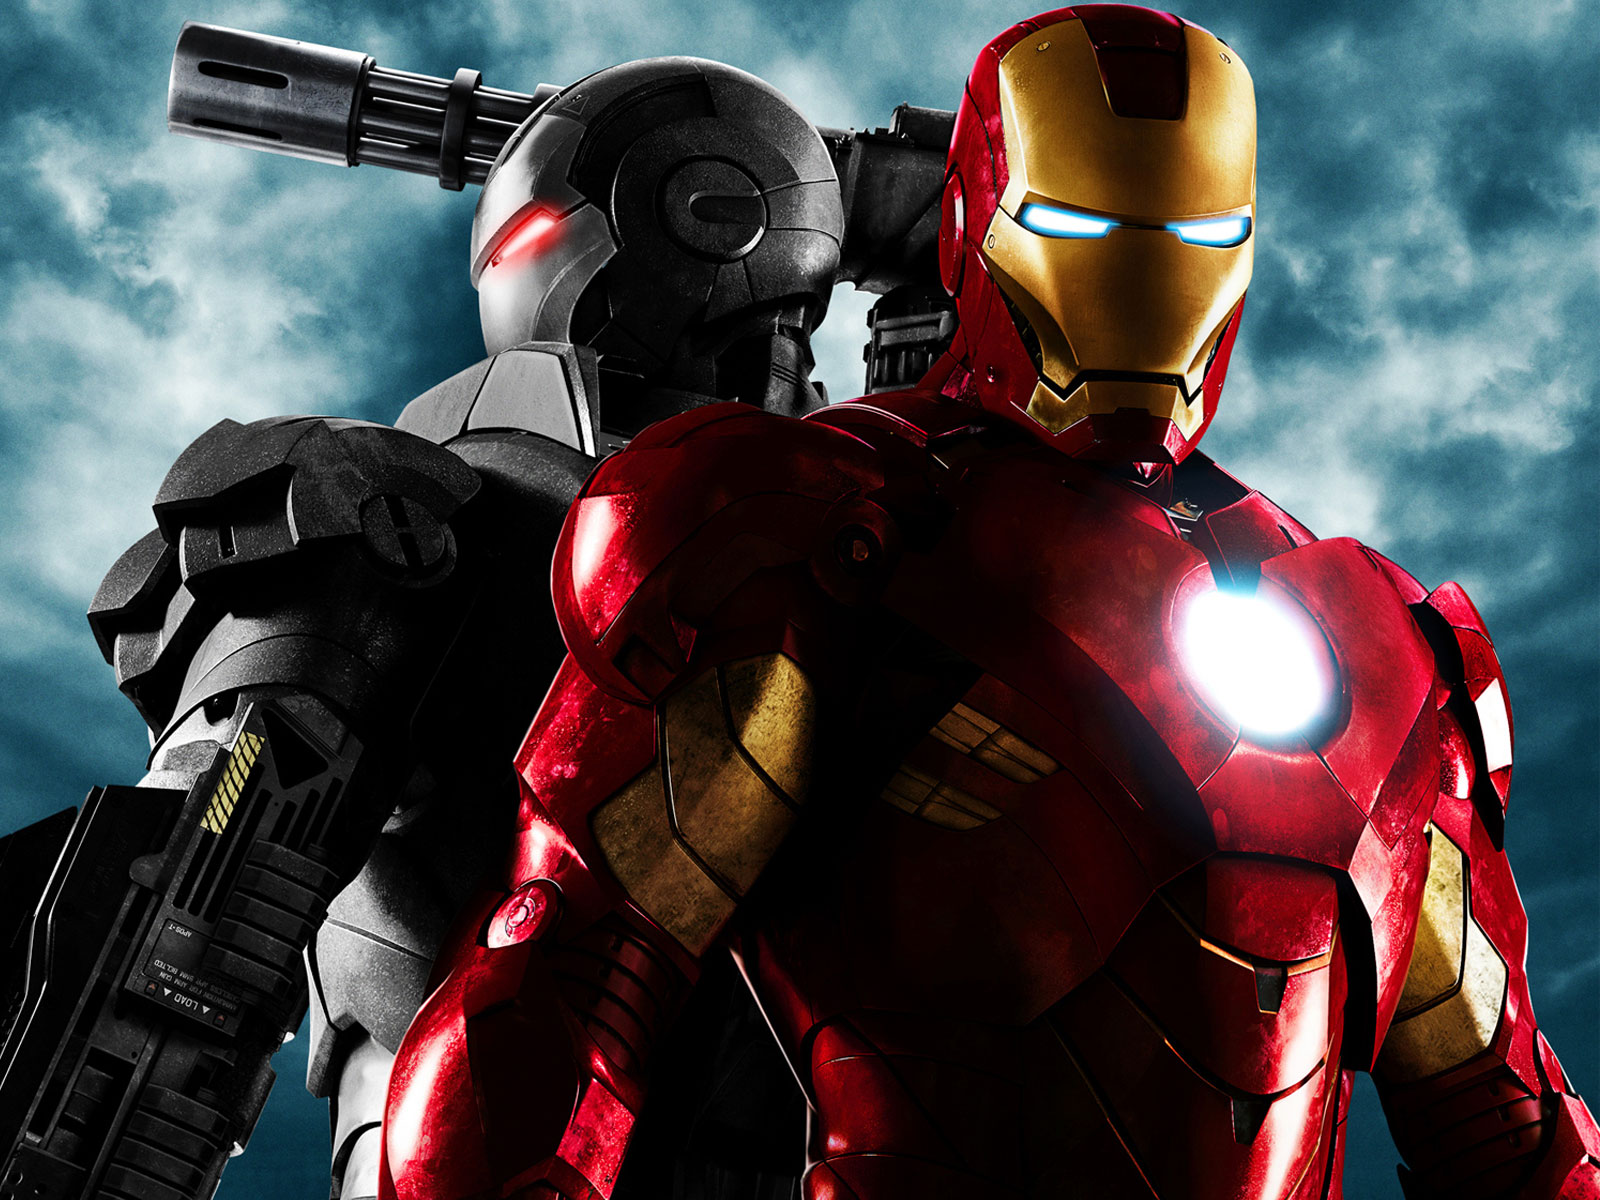 iron man wallpapers HD   Taringa 1600x1200